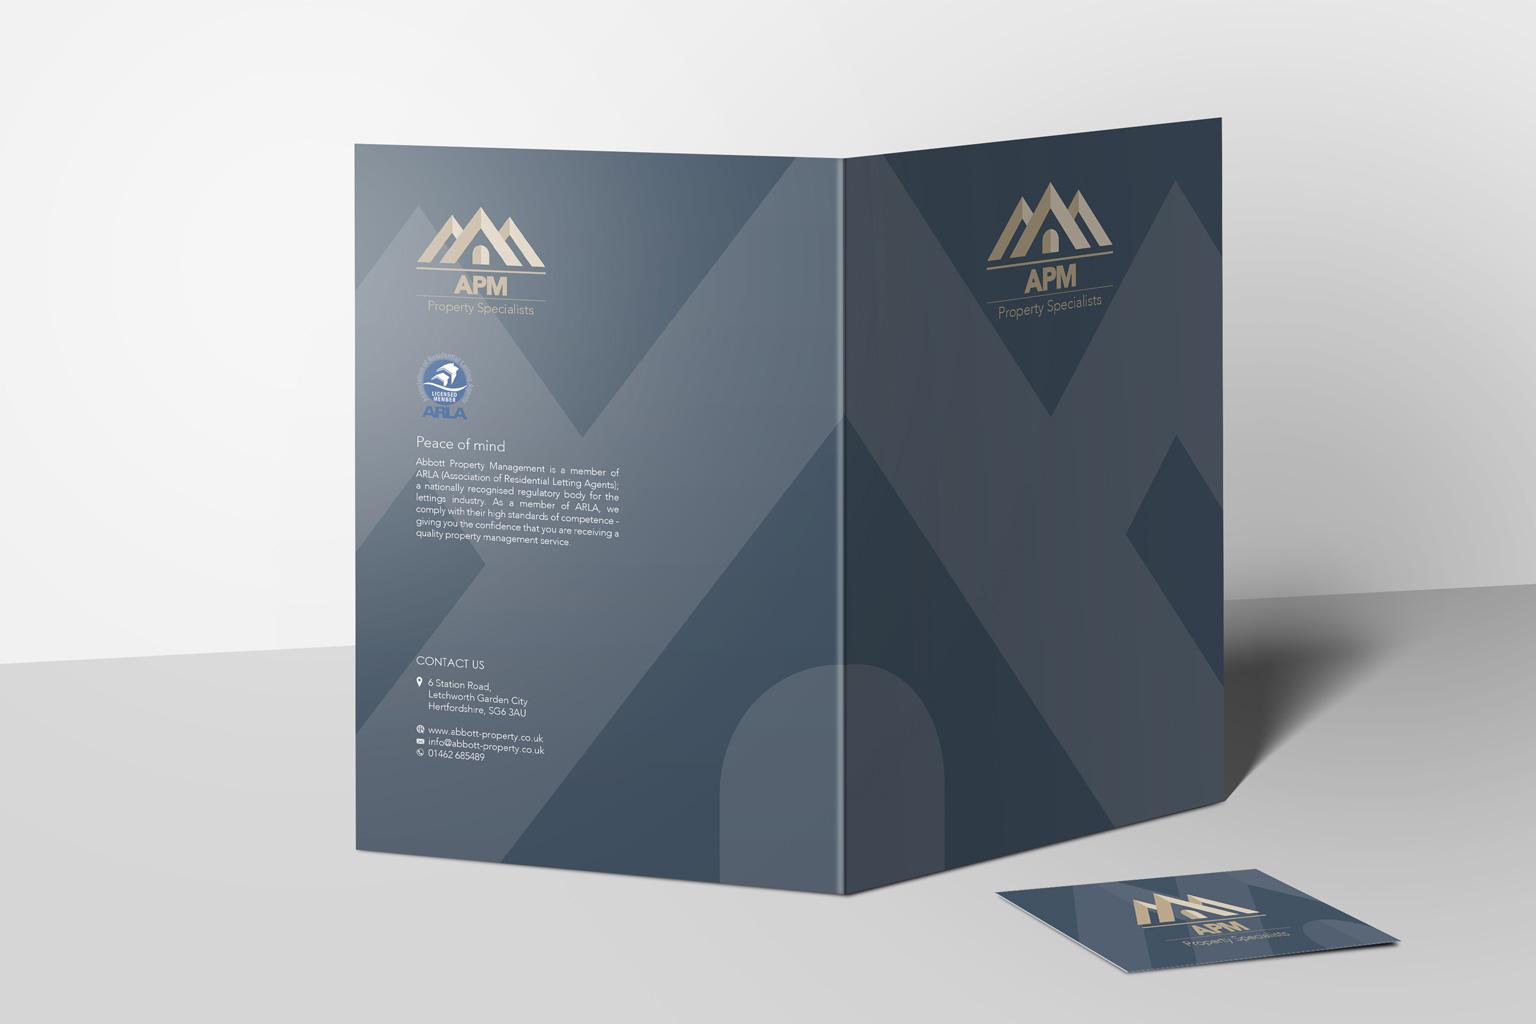 APM-folder-out